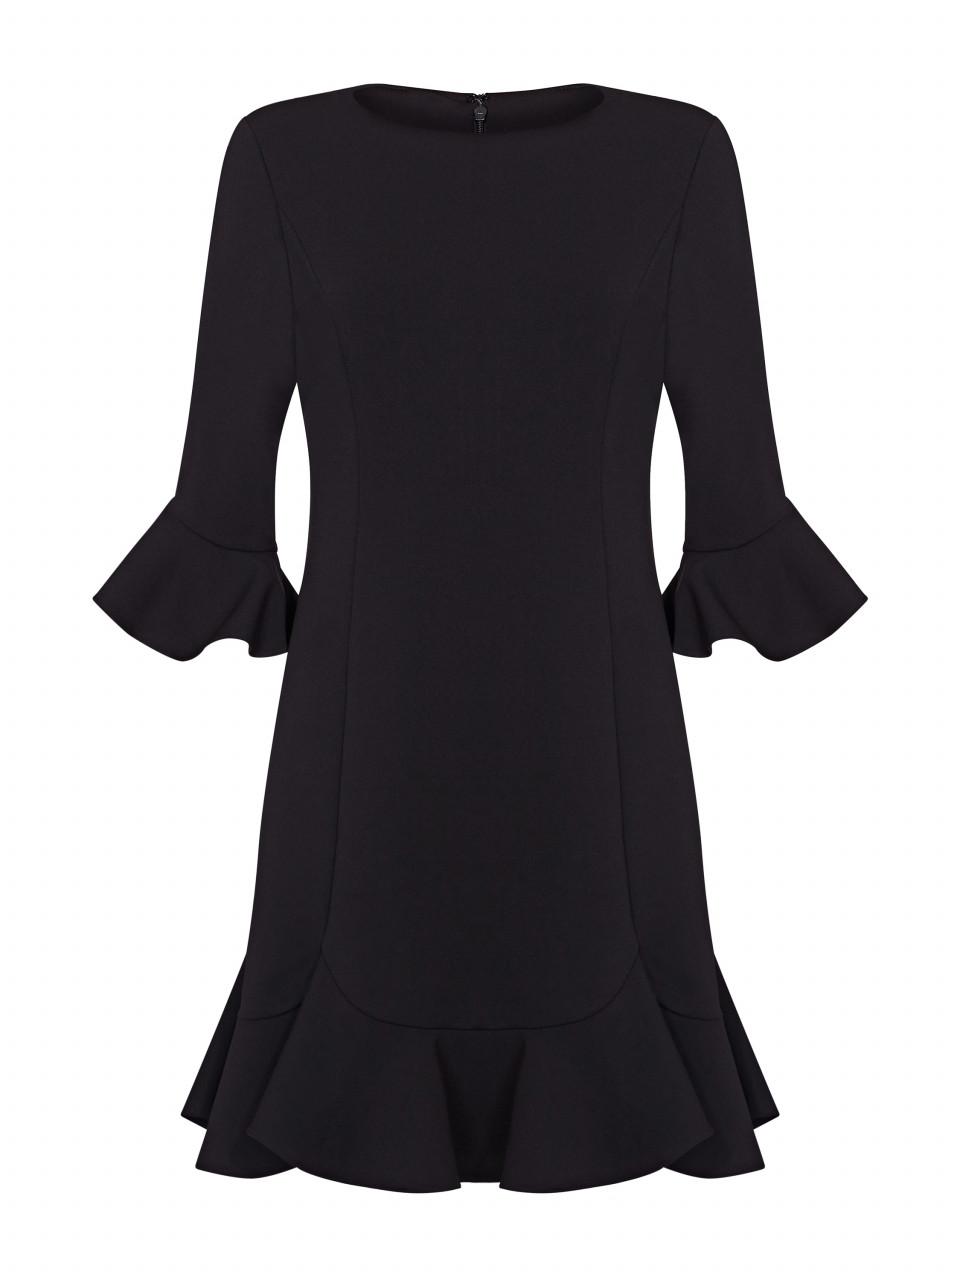 Knit crepe ruffled shift dress